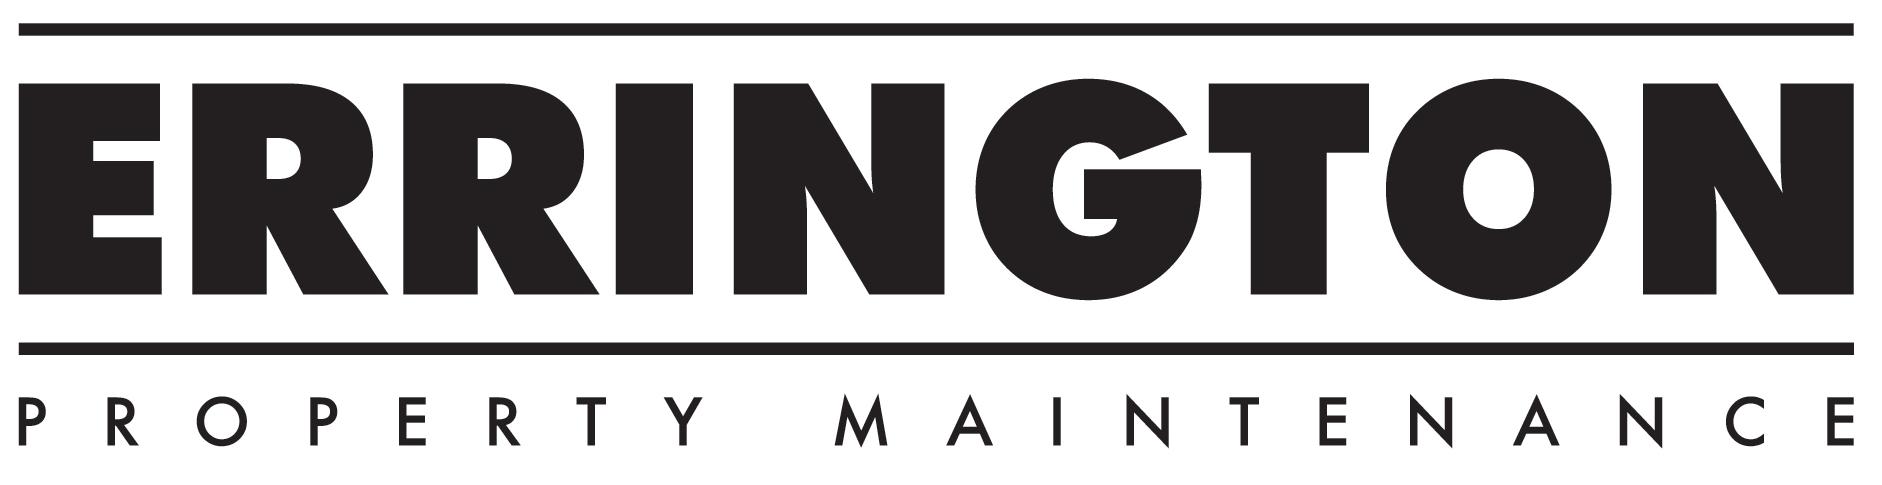 Errington Property Maintenance Logo